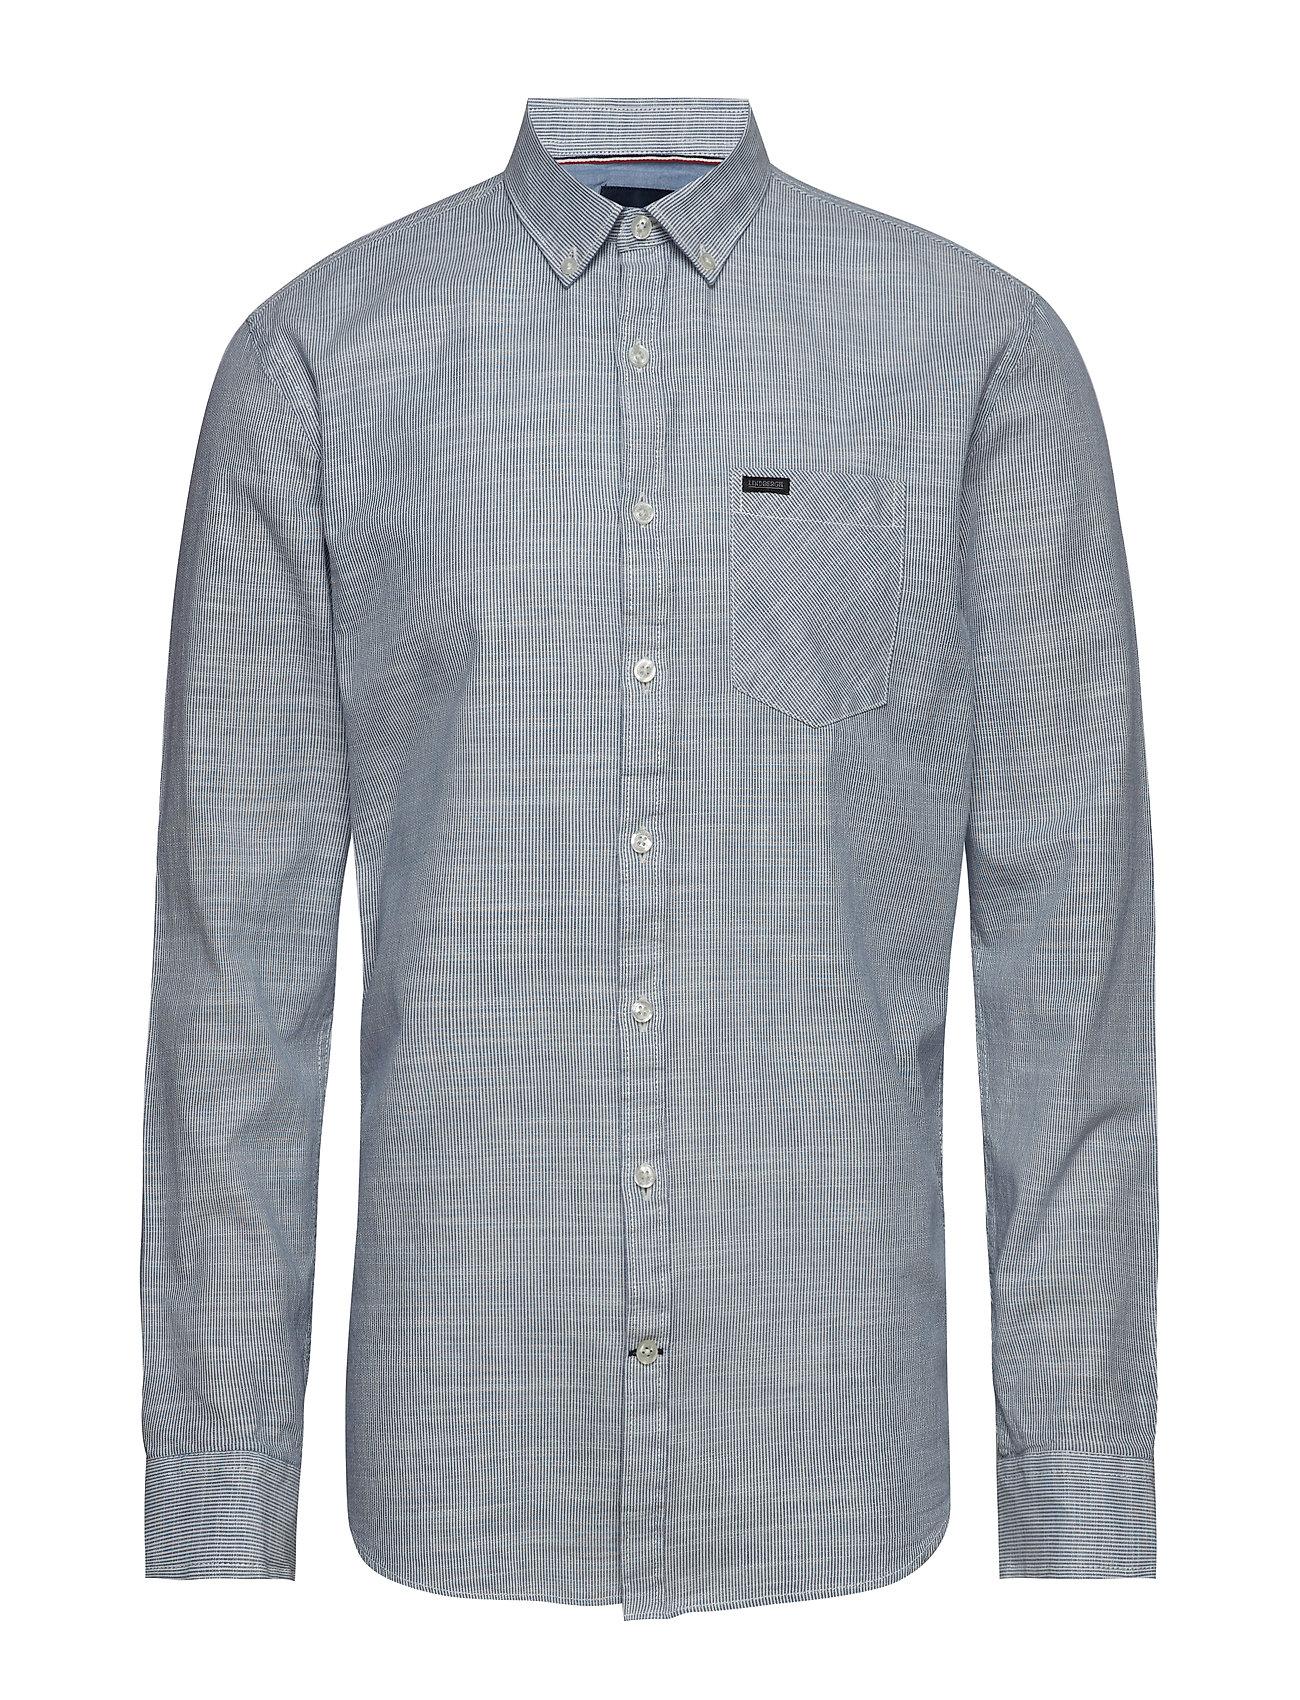 Lindbergh Pinstripe L/S shirt - LIGHT BLUE